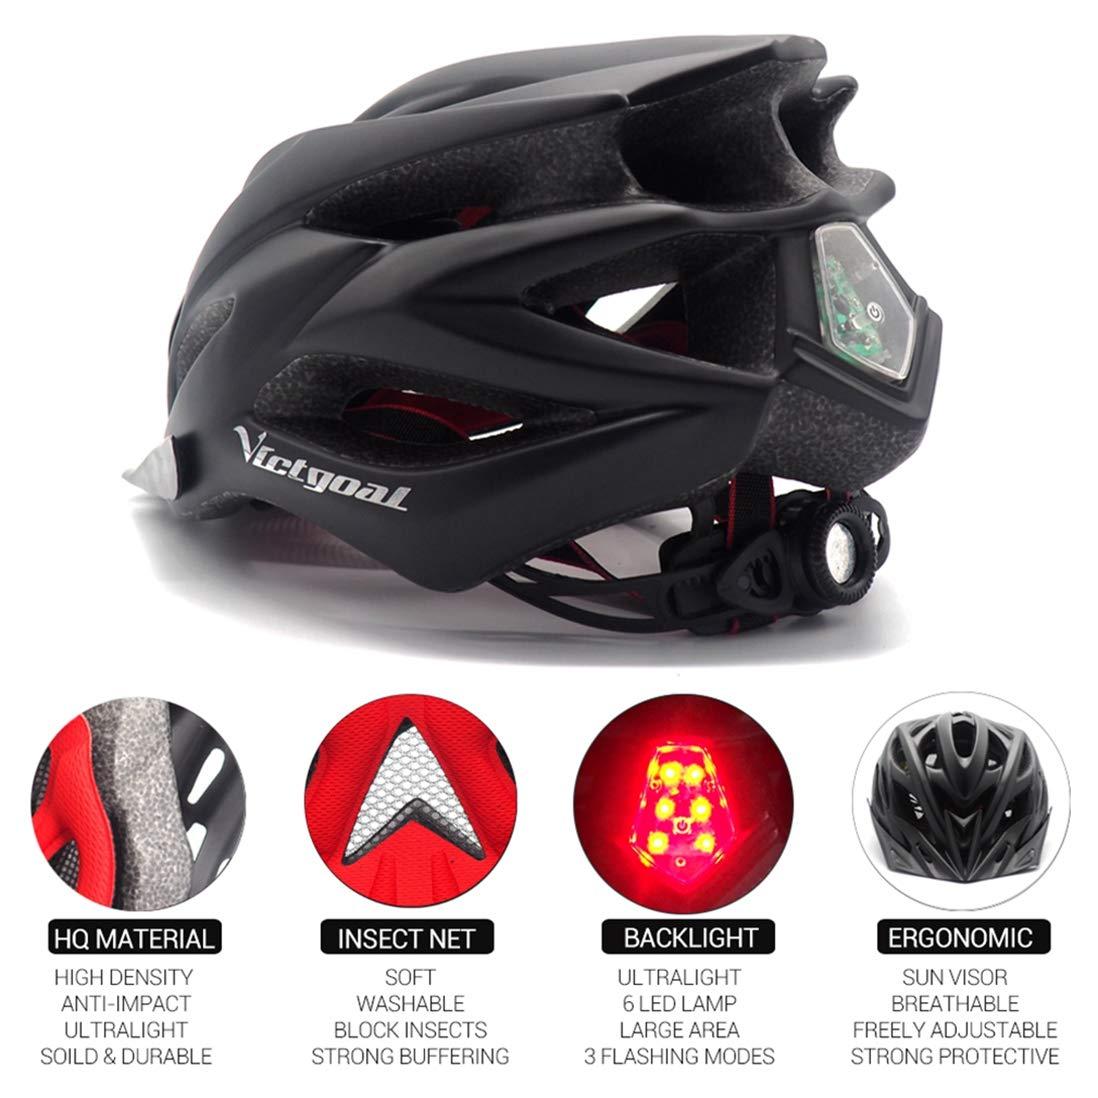 M/änner Frauen Breathable Ultra Sports Fahrradhelm Skateboard//Roller-Skate//Inline-Skating OLEEKA Fahrradhelm mit LED-Licht und Visor